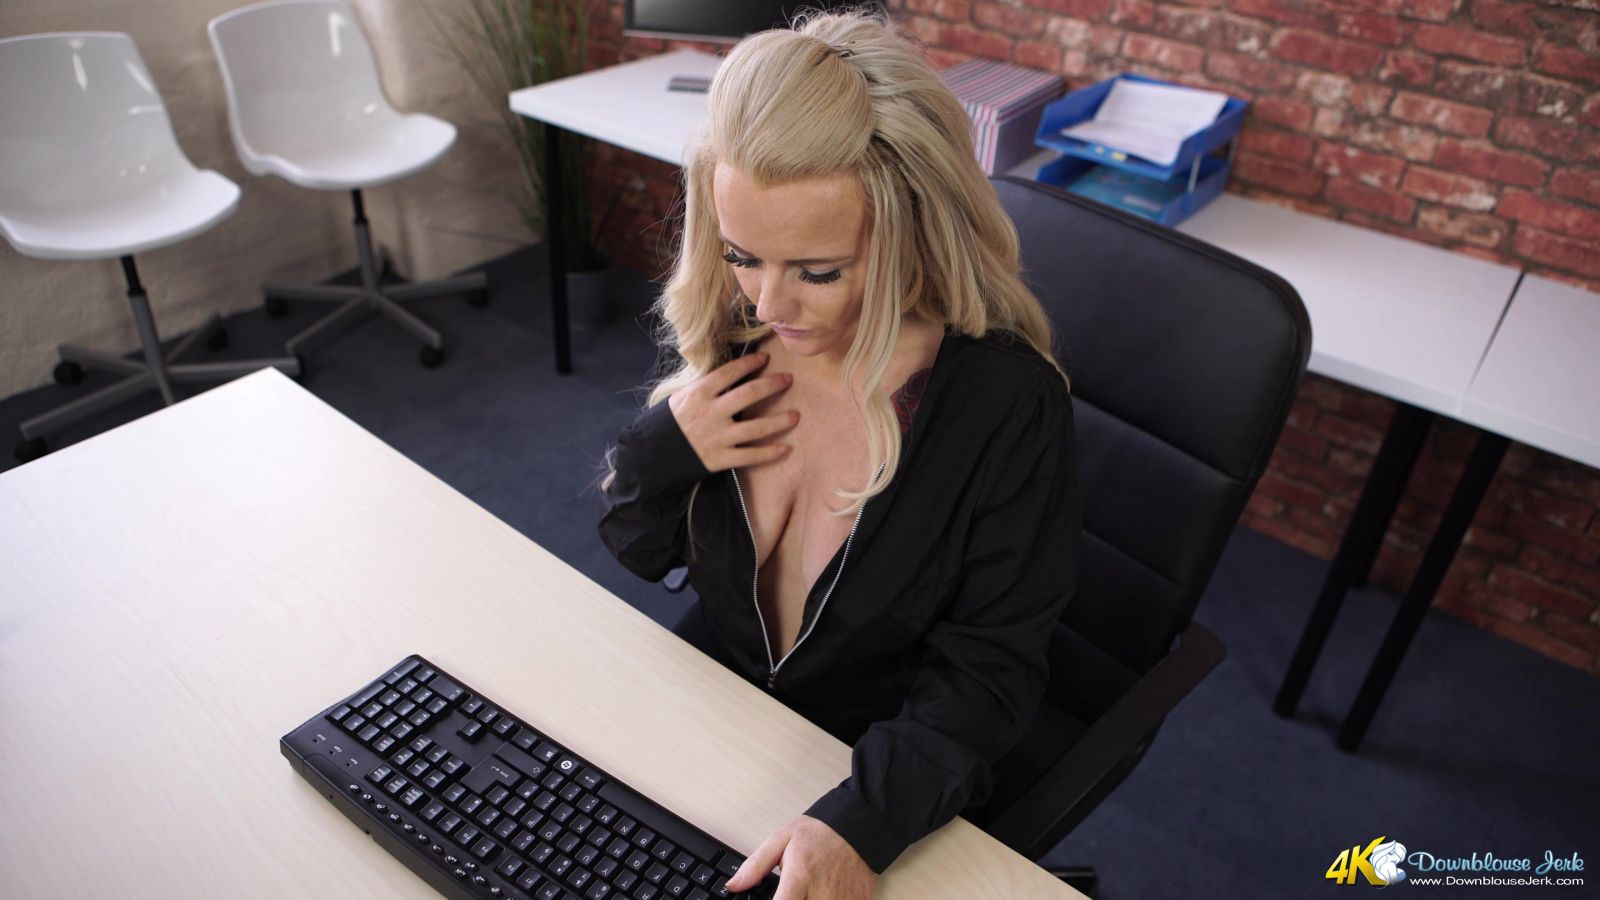 Lizzie Sneaky Webcam Spy 105